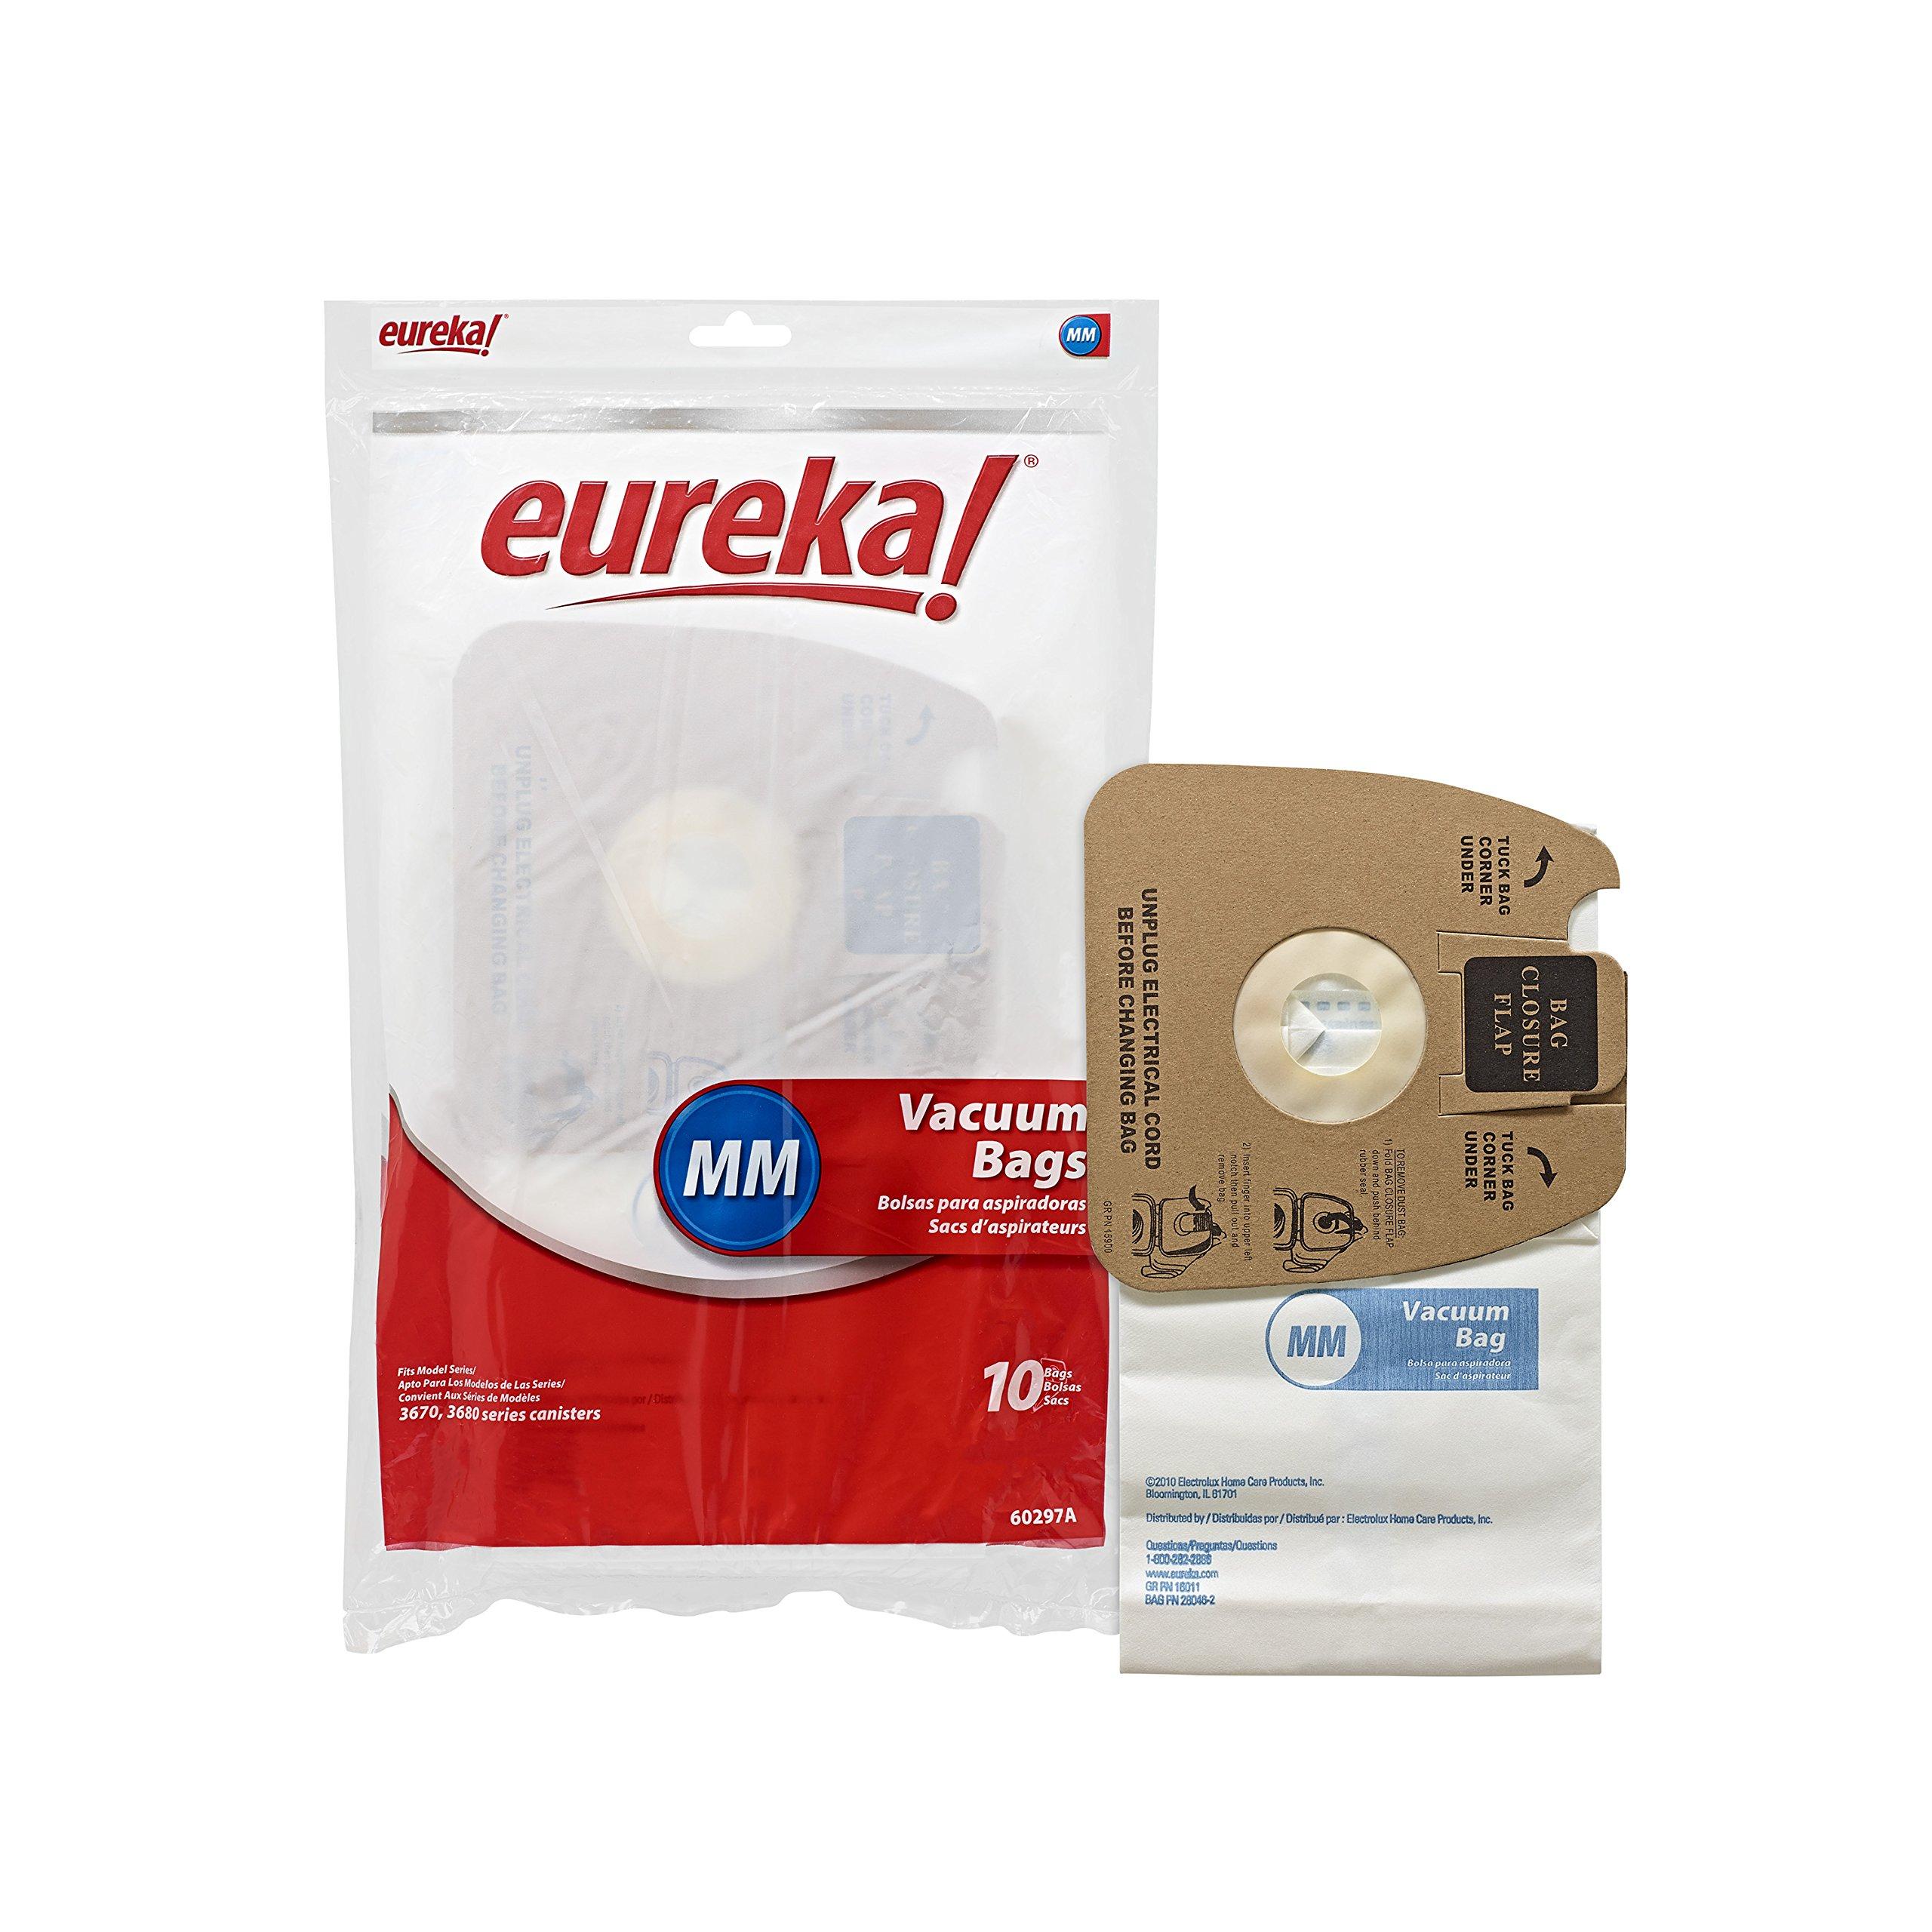 Genuine Eureka MM Vacuum Bag 60297A Style - 10 bags per Unit by EUREKA